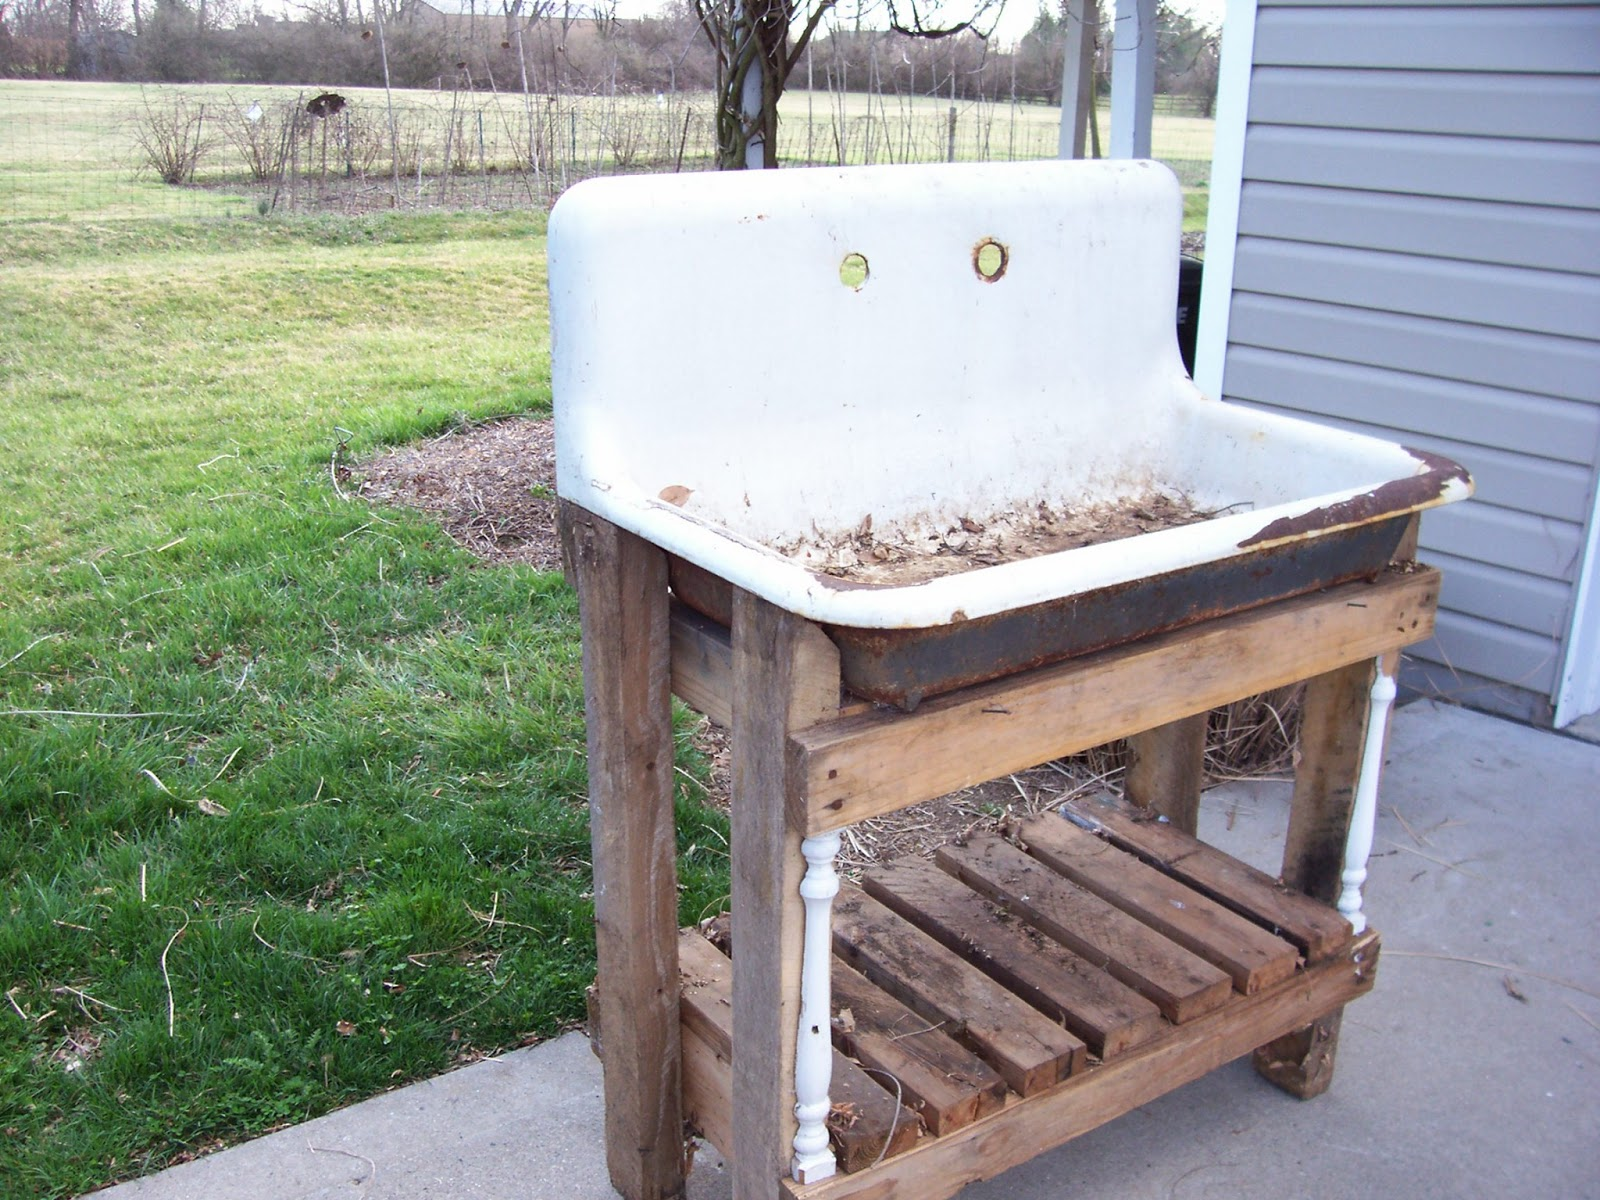 Sweet Vintage of Mine: RE-PURPOSED VINTAGE POTTING SINKS ... on Outdoor Patio Sink id=42492